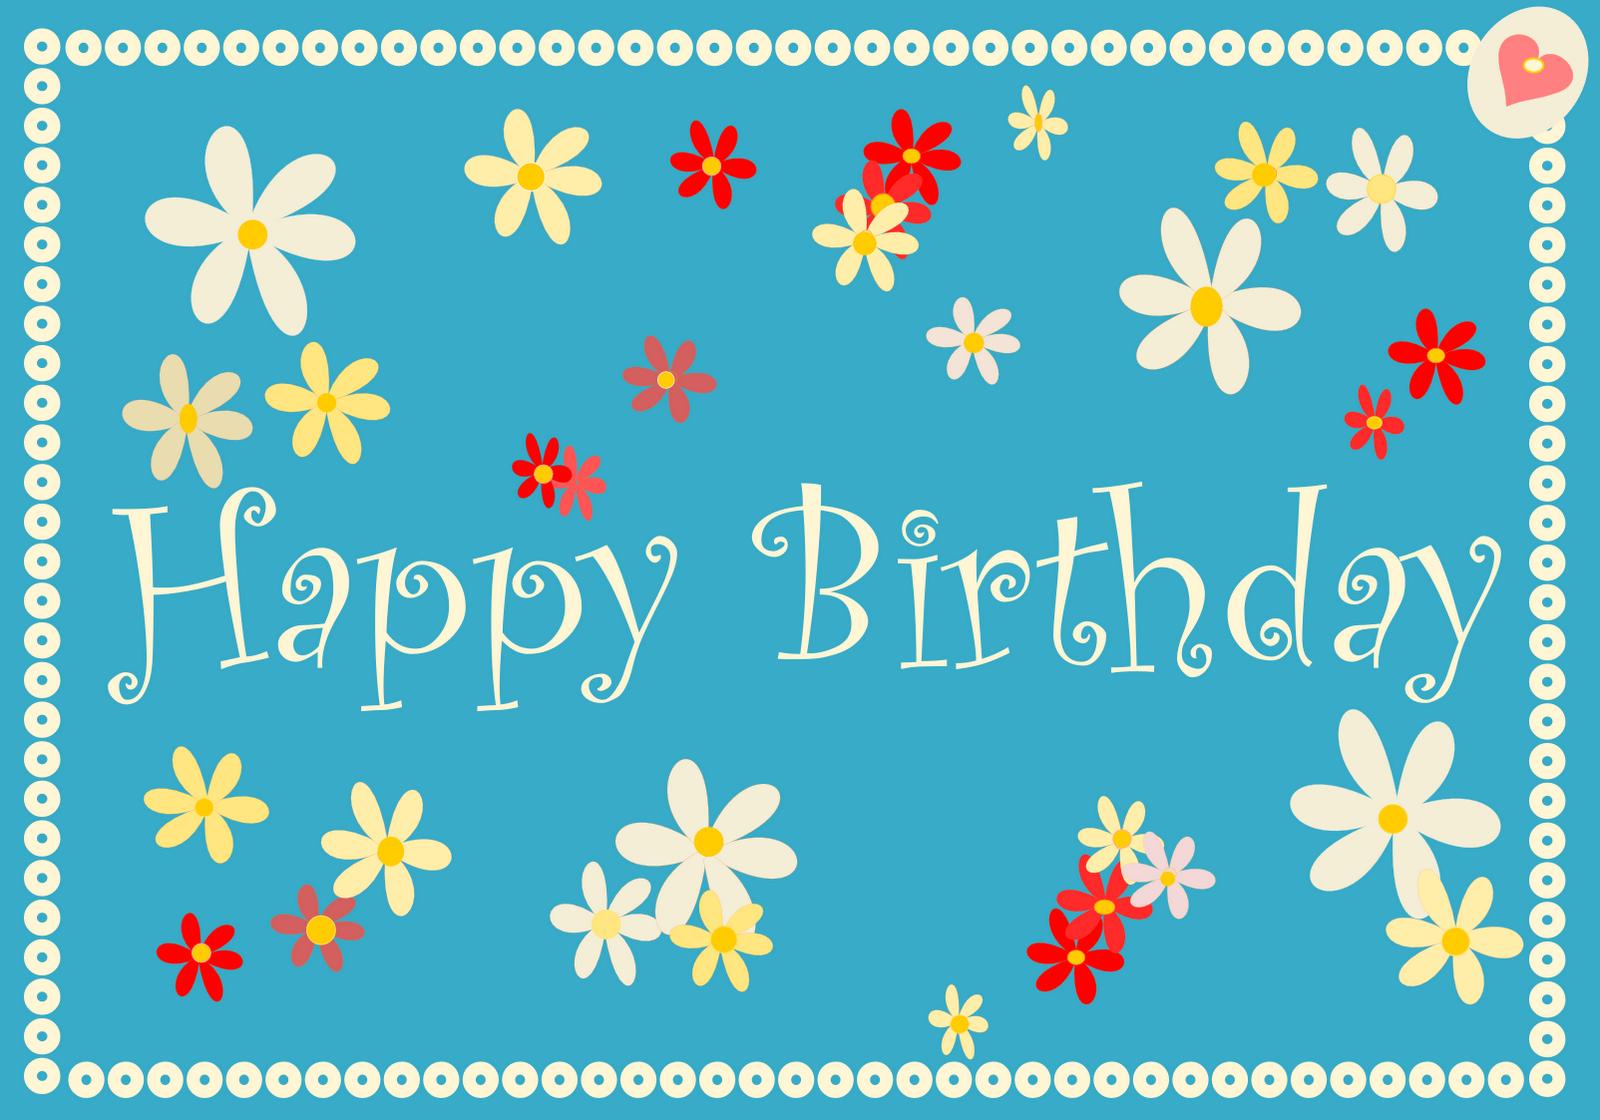 Birthday cards free free printable happy birthday cards birthday cards free free printable happy birthday cards ausdruckbare geburtstagskarten kristyandbryce Image collections